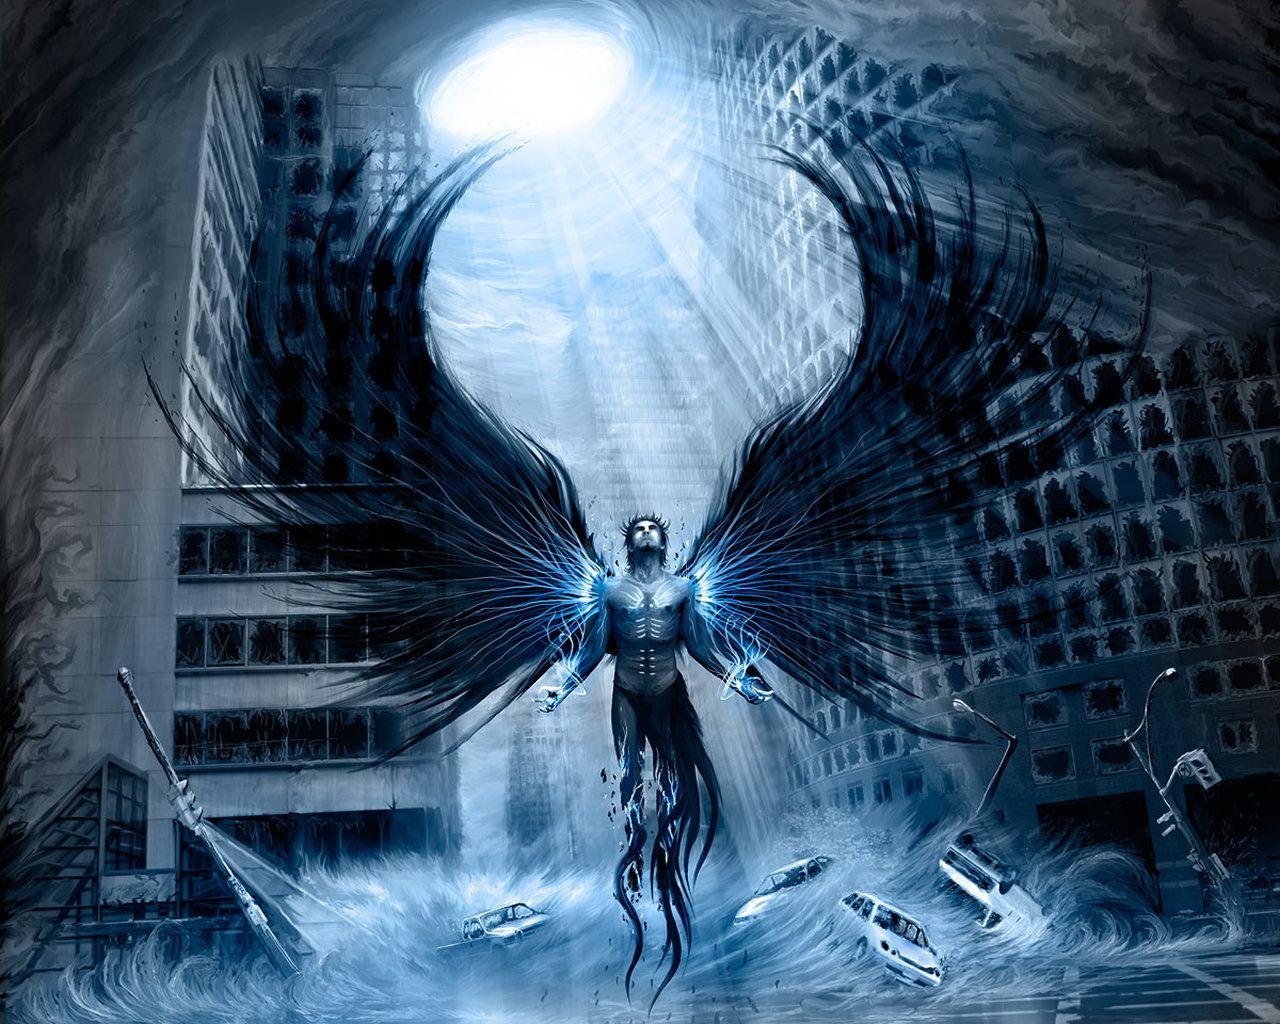 67 best angels amoung us images on pinterest | fallen angels